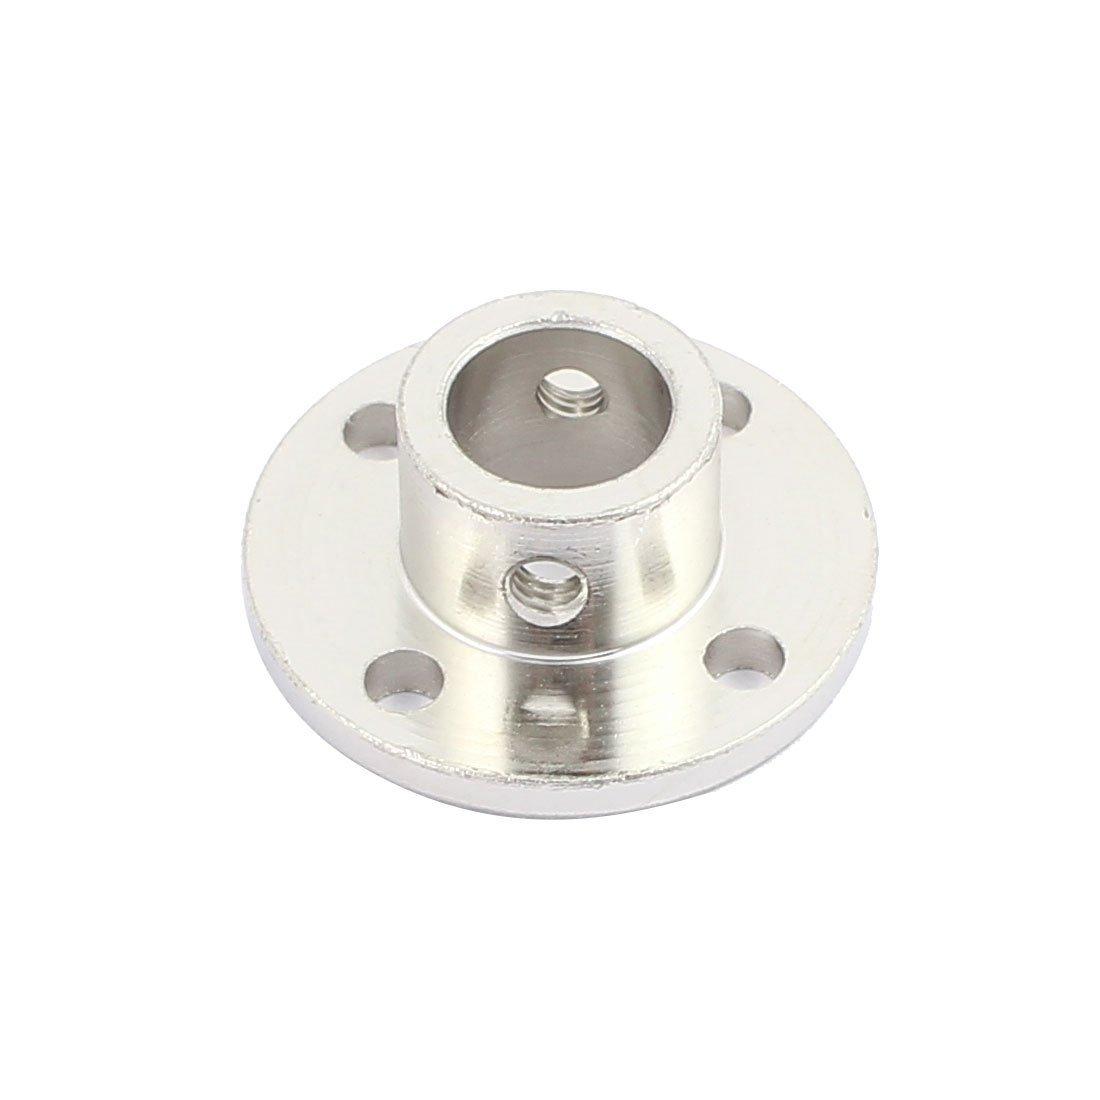 11mm Rigid Flange Motor Coupling Motor Shaft Connector Motor Connector for DIY Parts